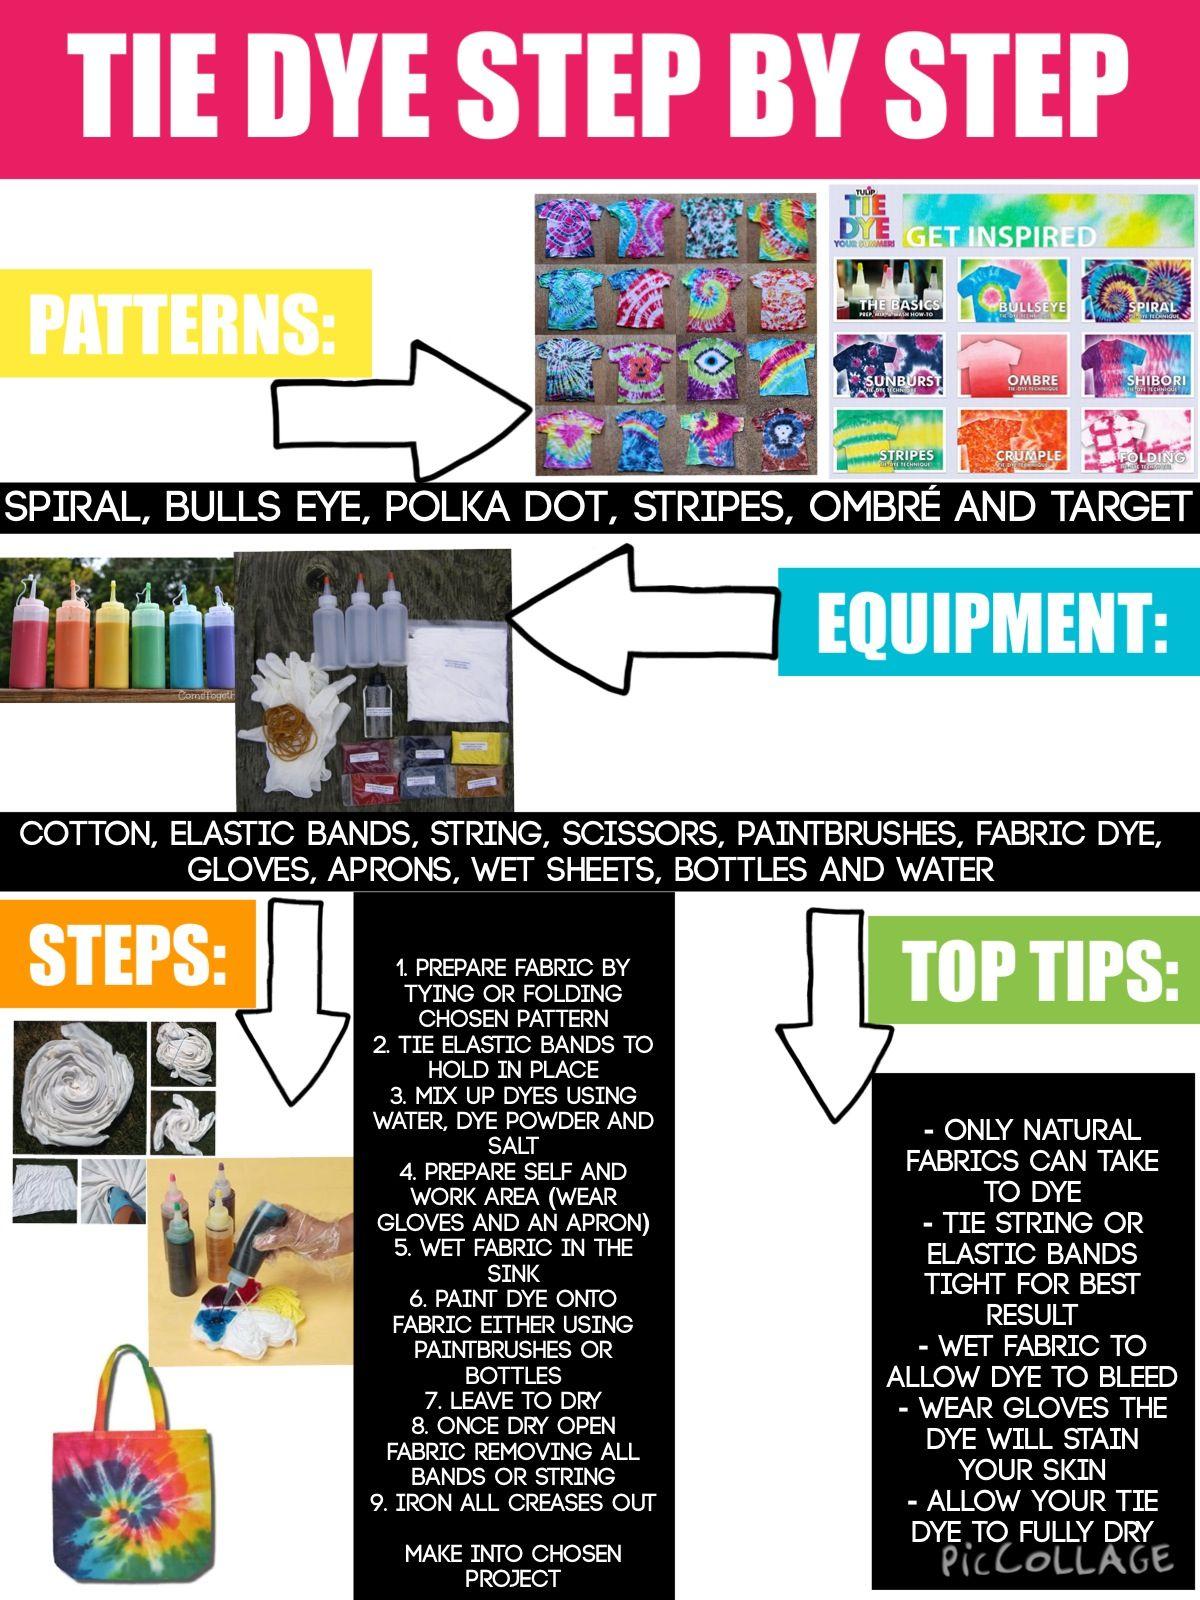 Tie Dye Step By Step